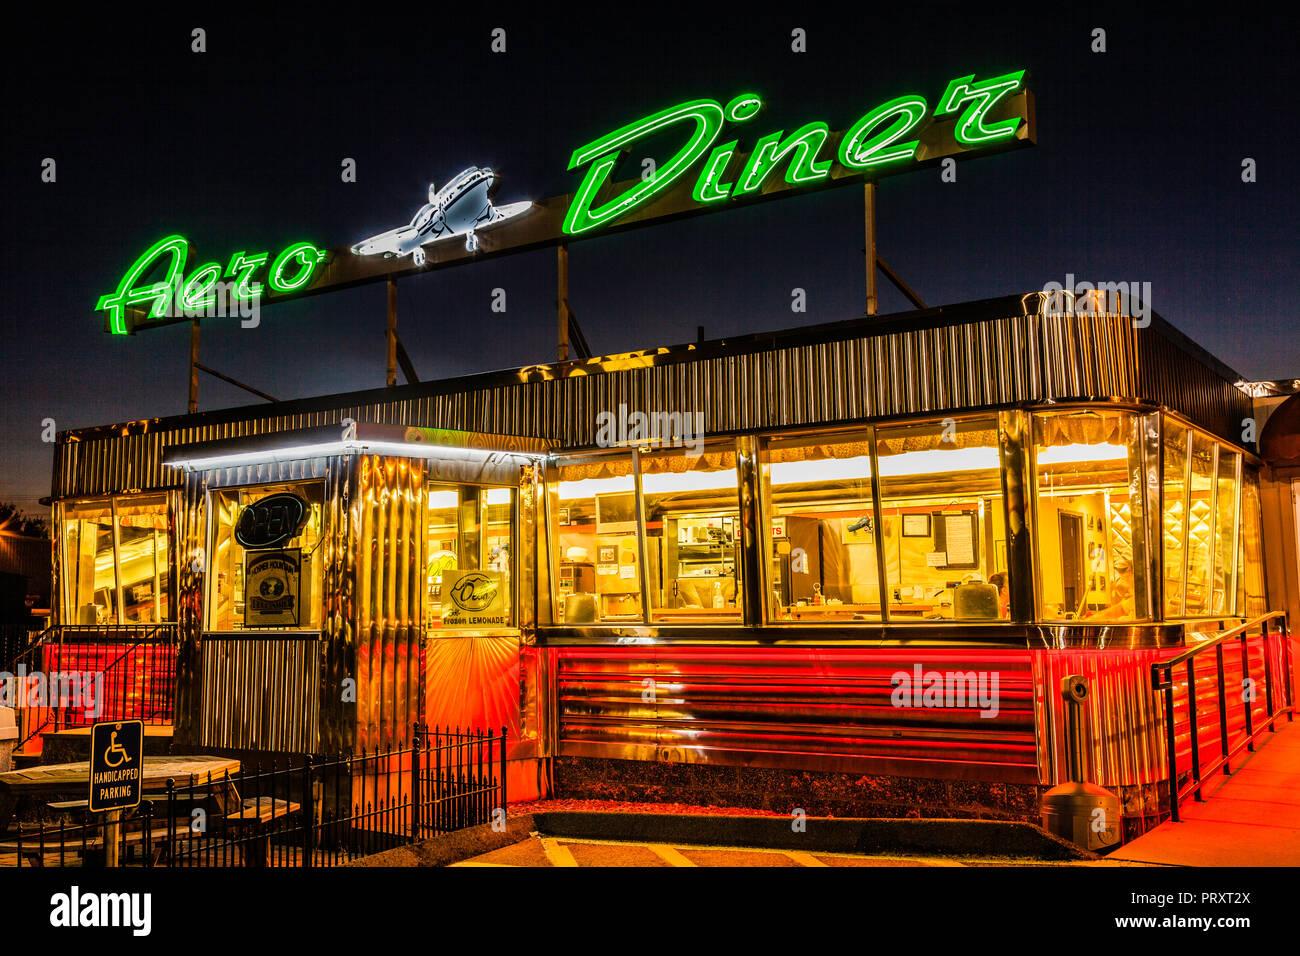 Aero Diner _ North Windham, Connecticut, USA - Stock Image